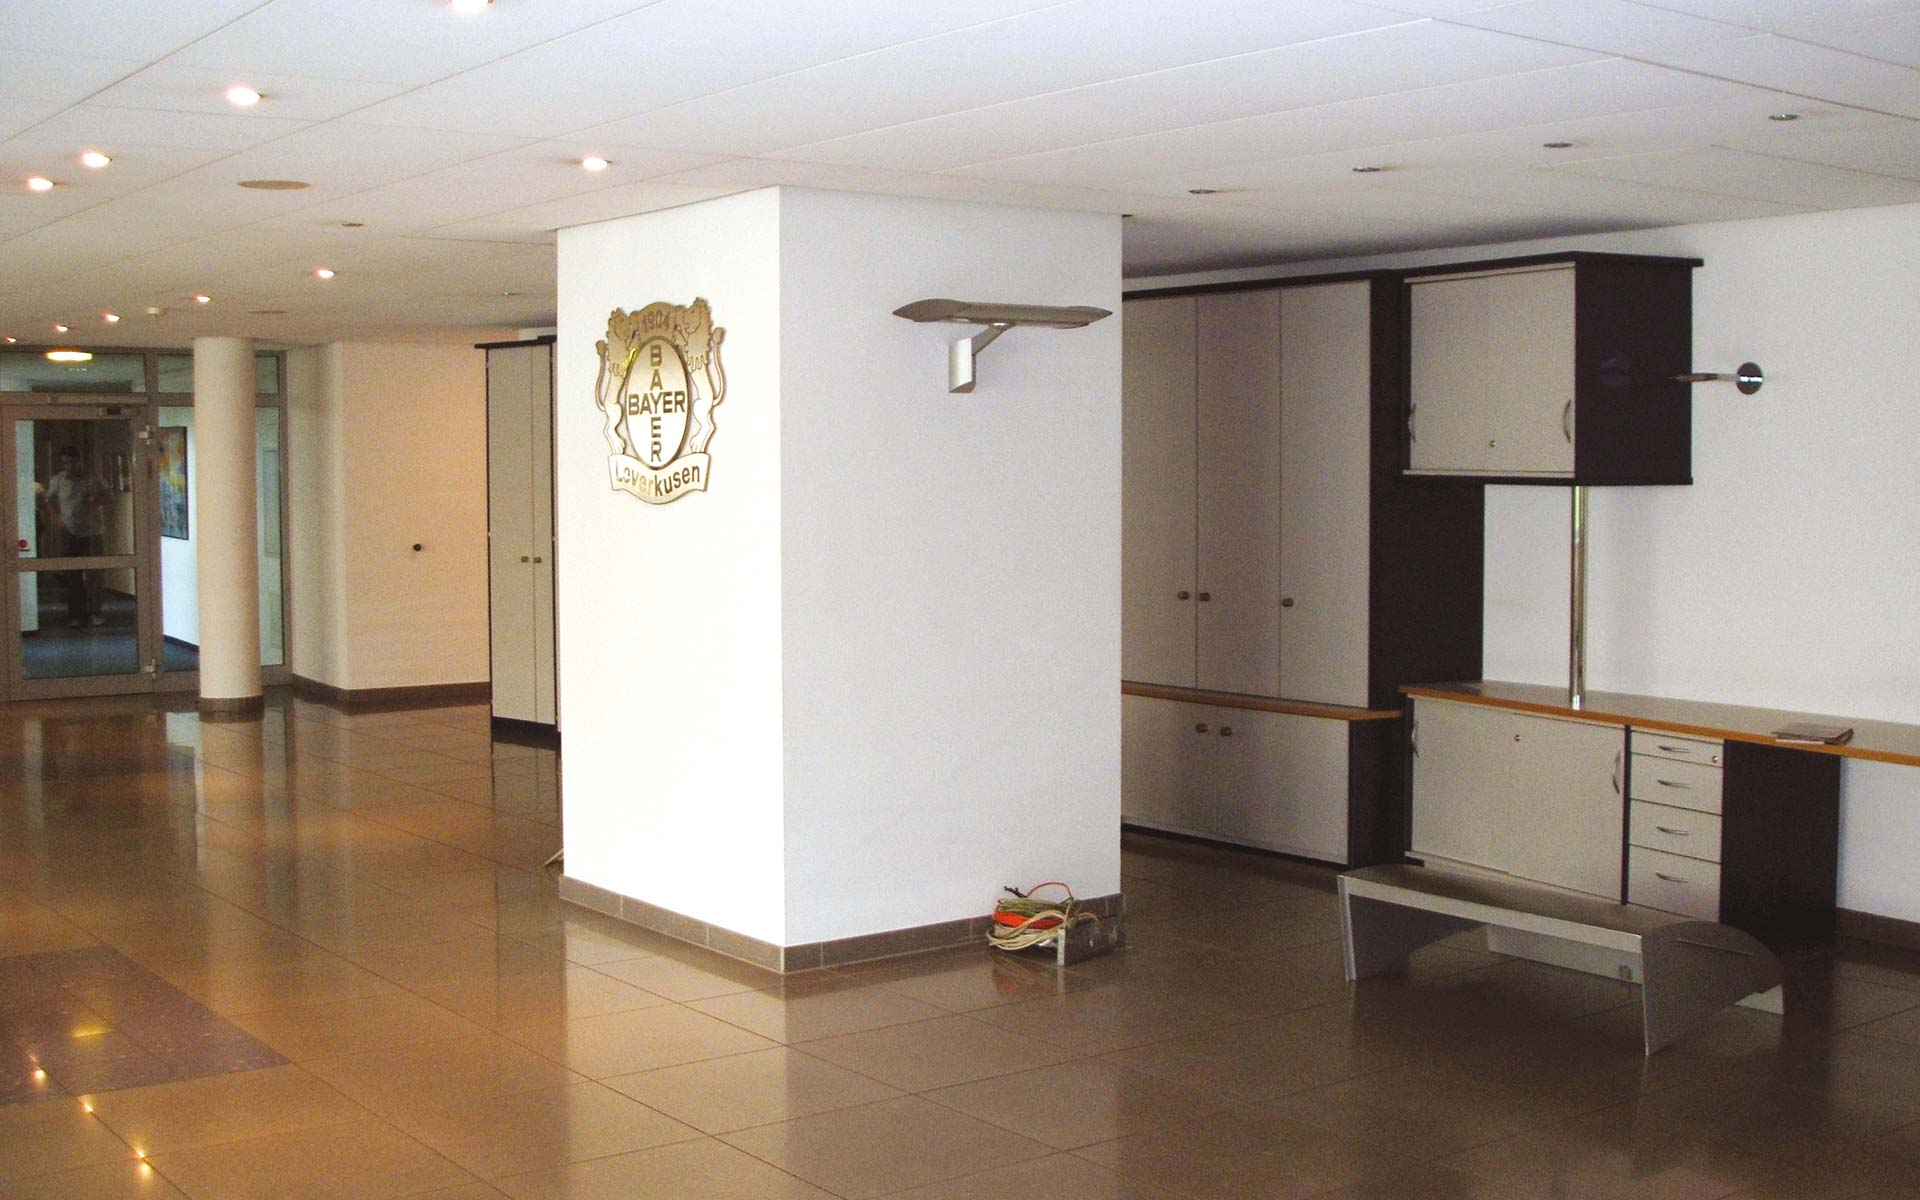 Bayer 04 Foyer BayArena, Zustand vor dem Umbau